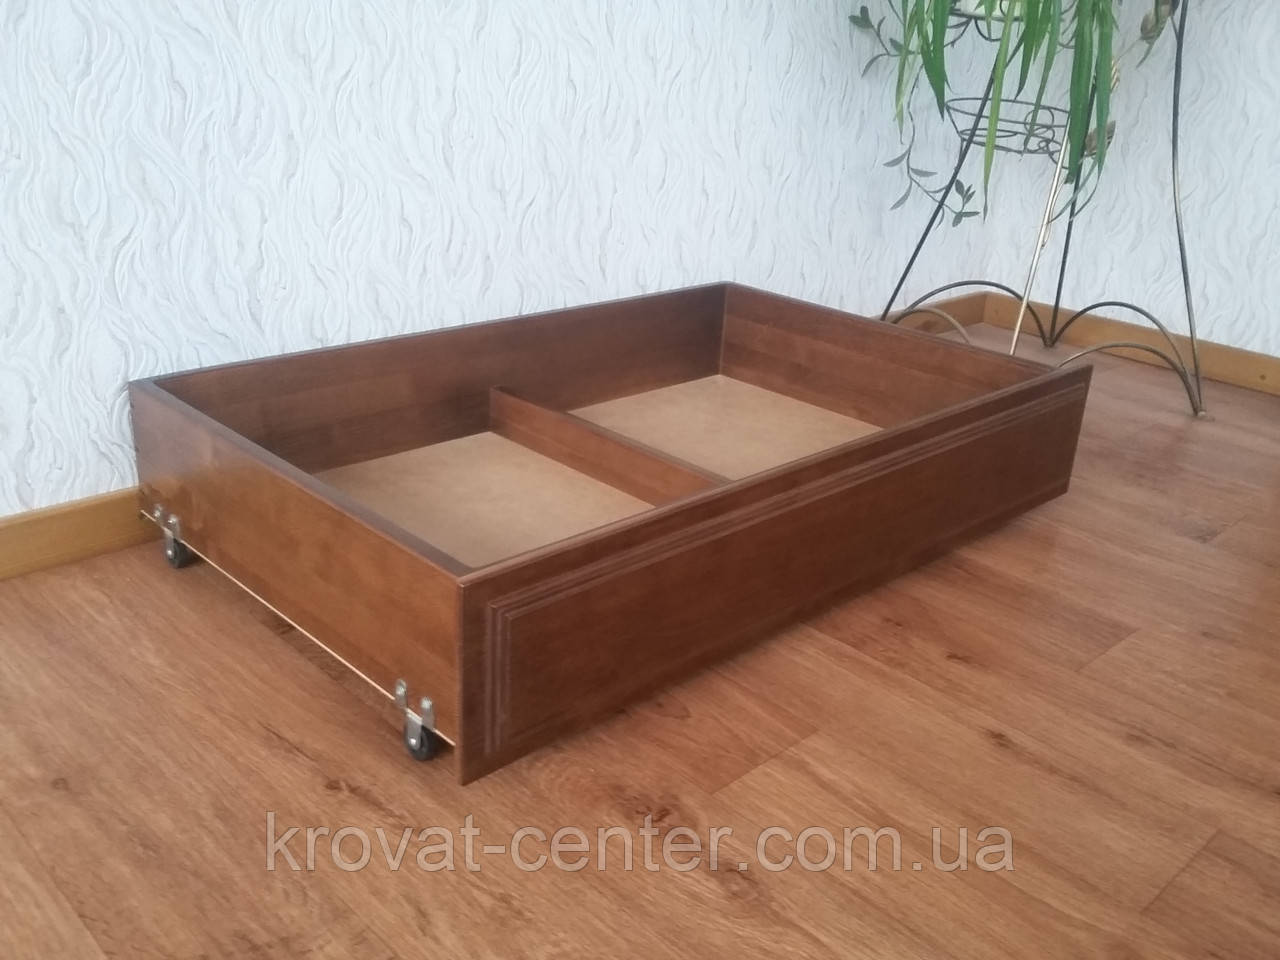 Ящик на колесиках (длина 100 см)